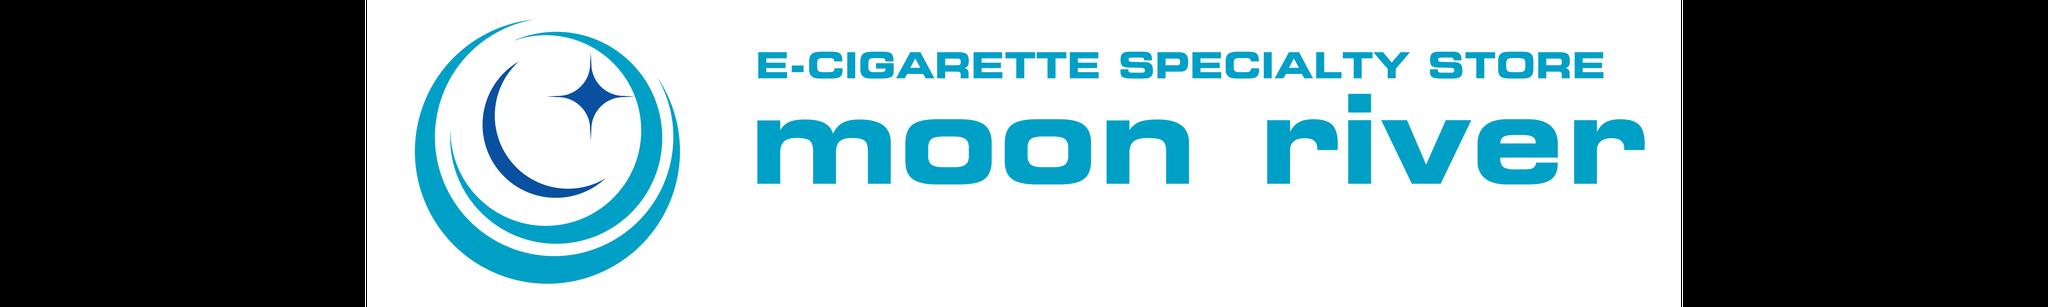 moon river ー電子タバコ専門店ー